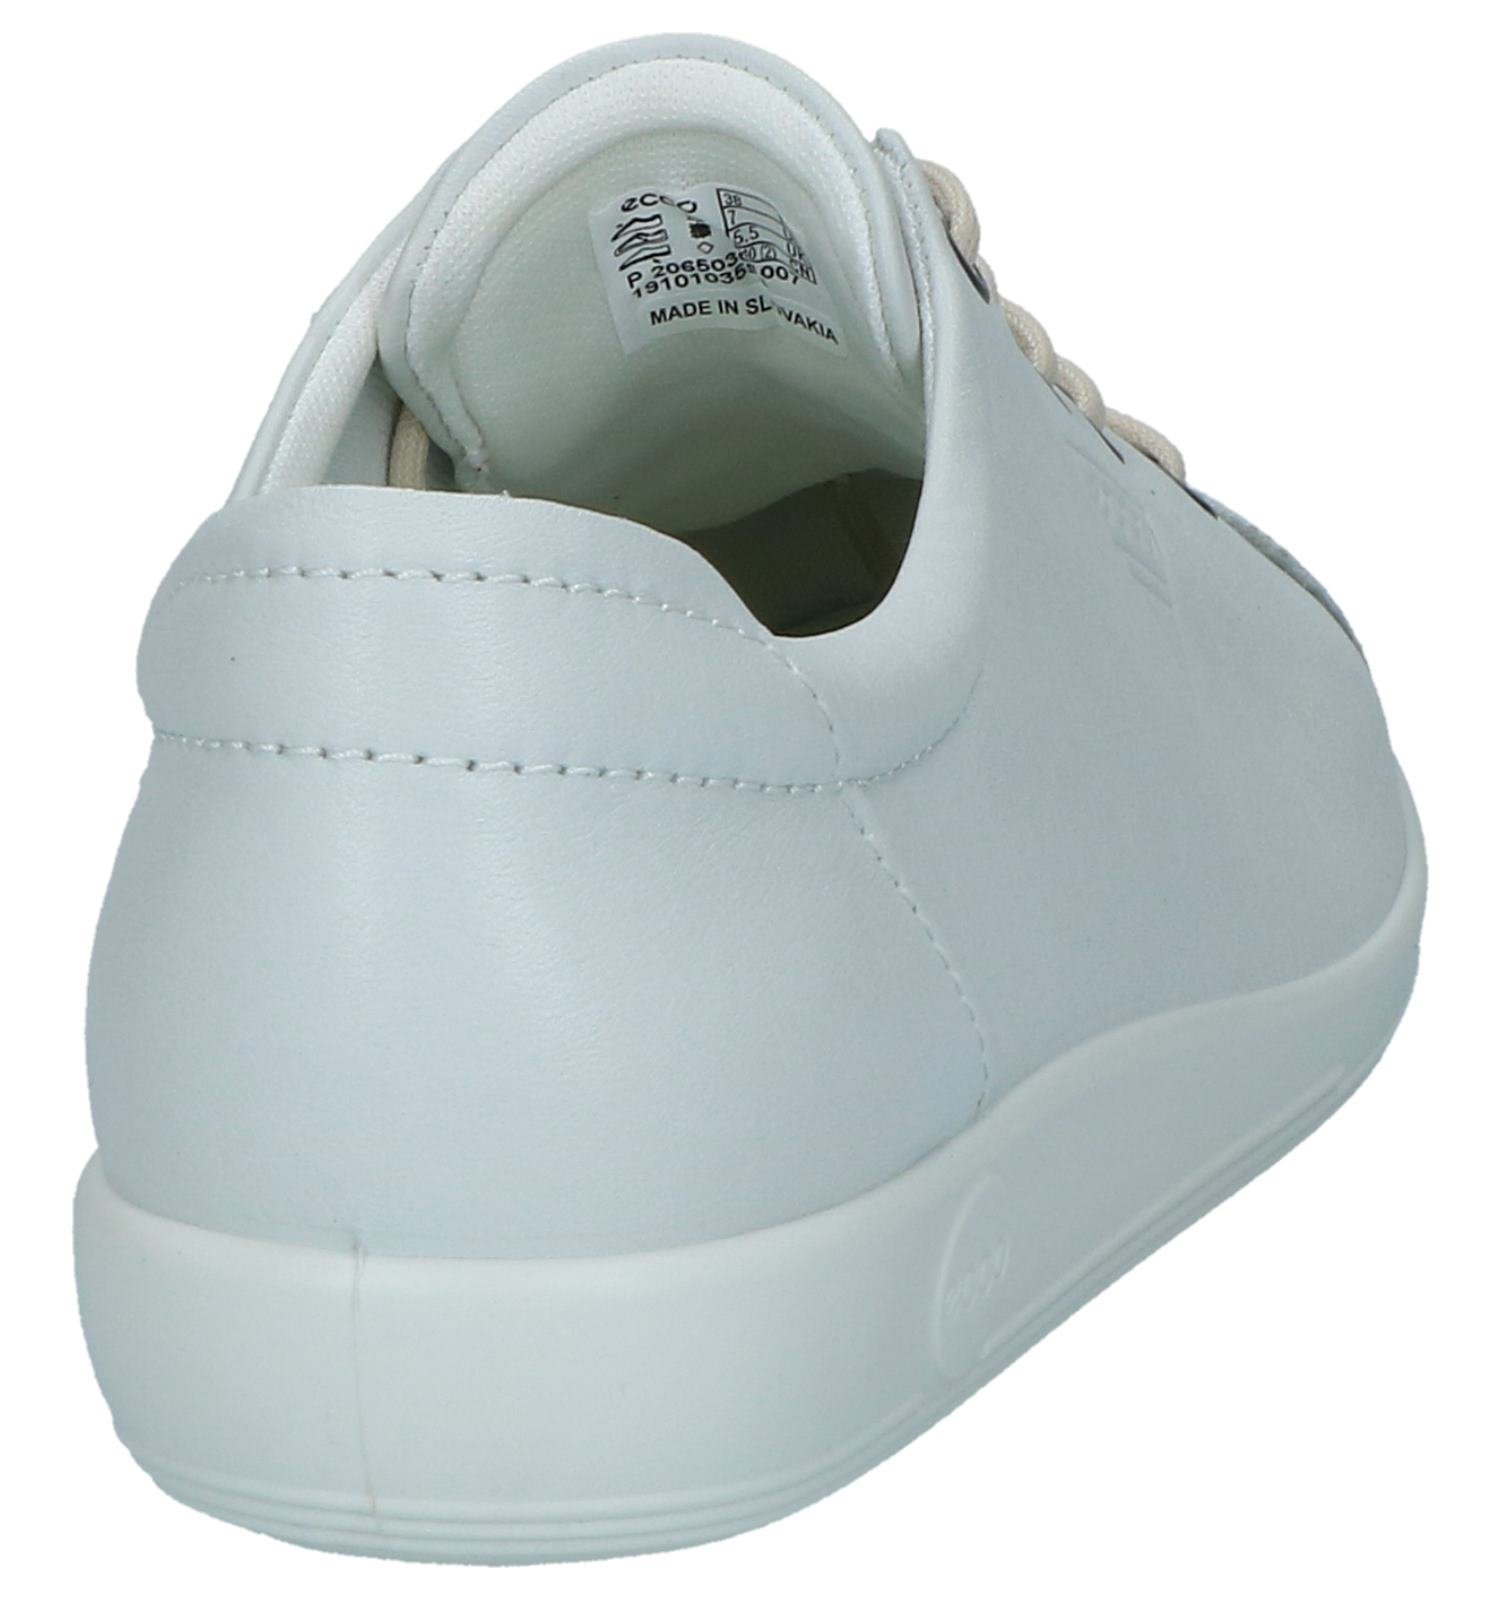 Witte 2 Ecco Veterschoenen Soft 0 ARj54L